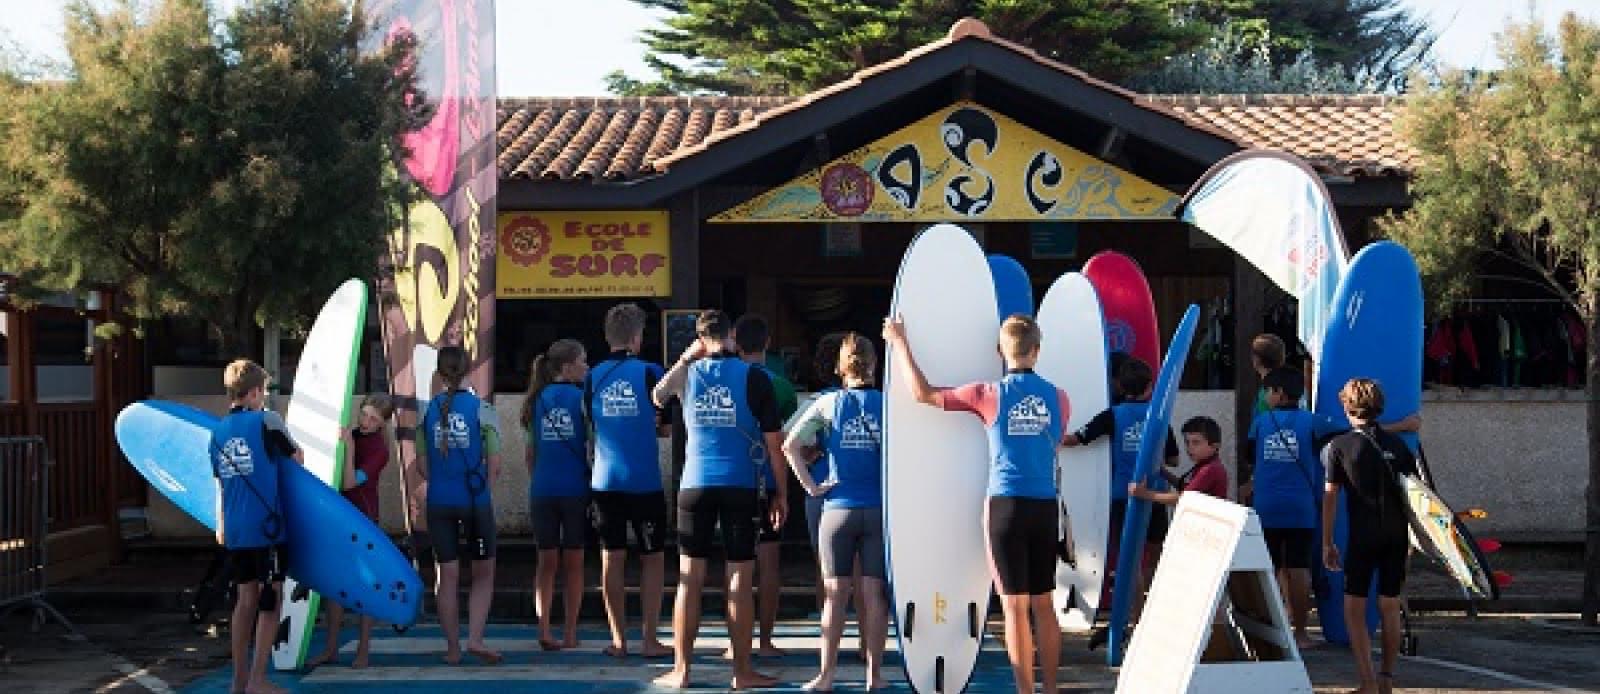 OSC Soulac Surf4